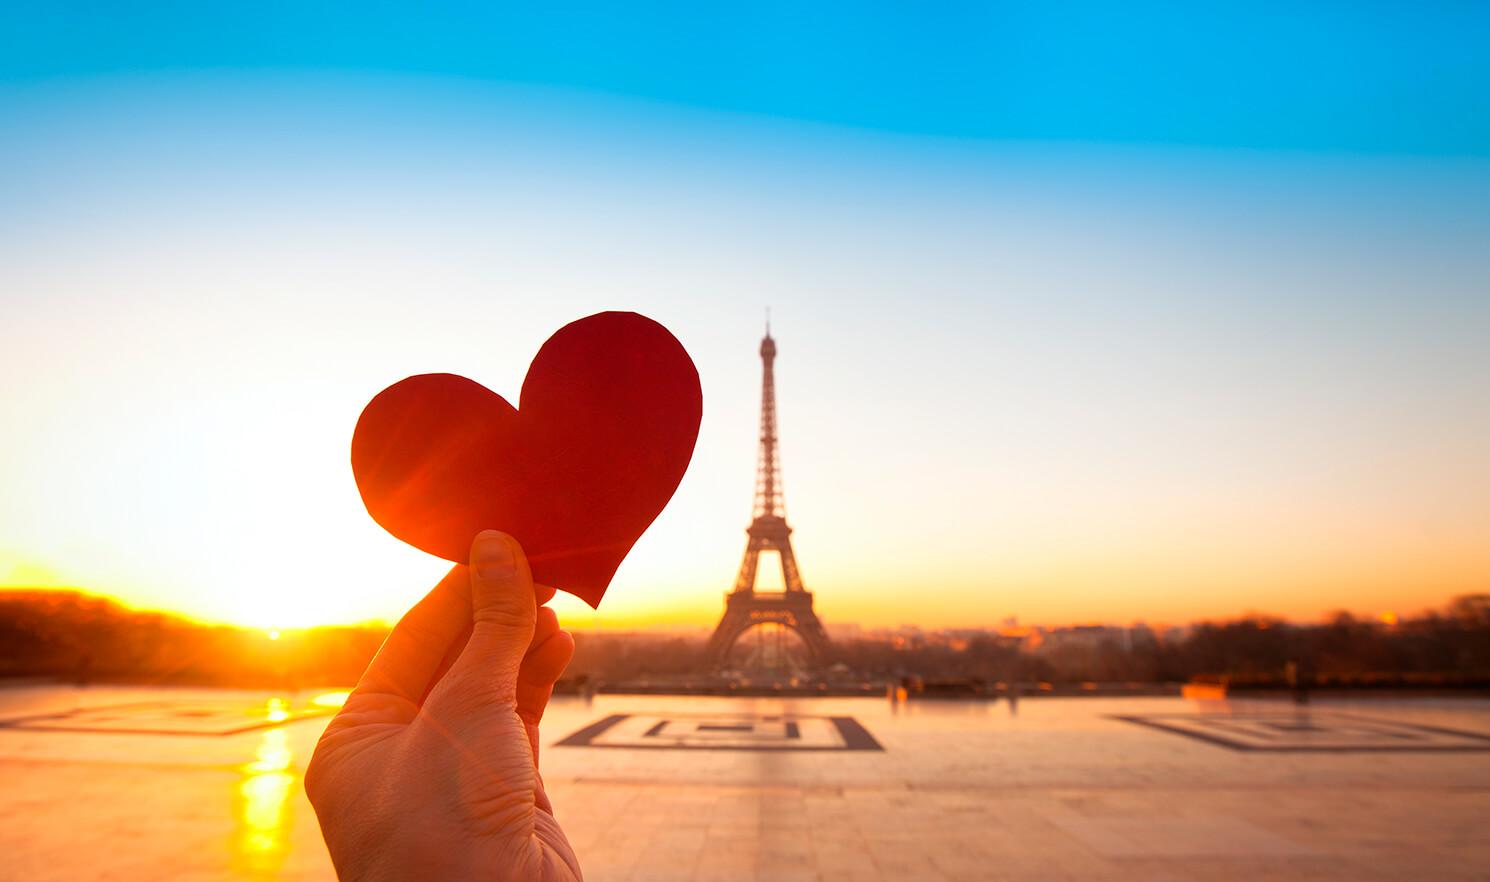 París - 10 ciudades más románticas de Europa